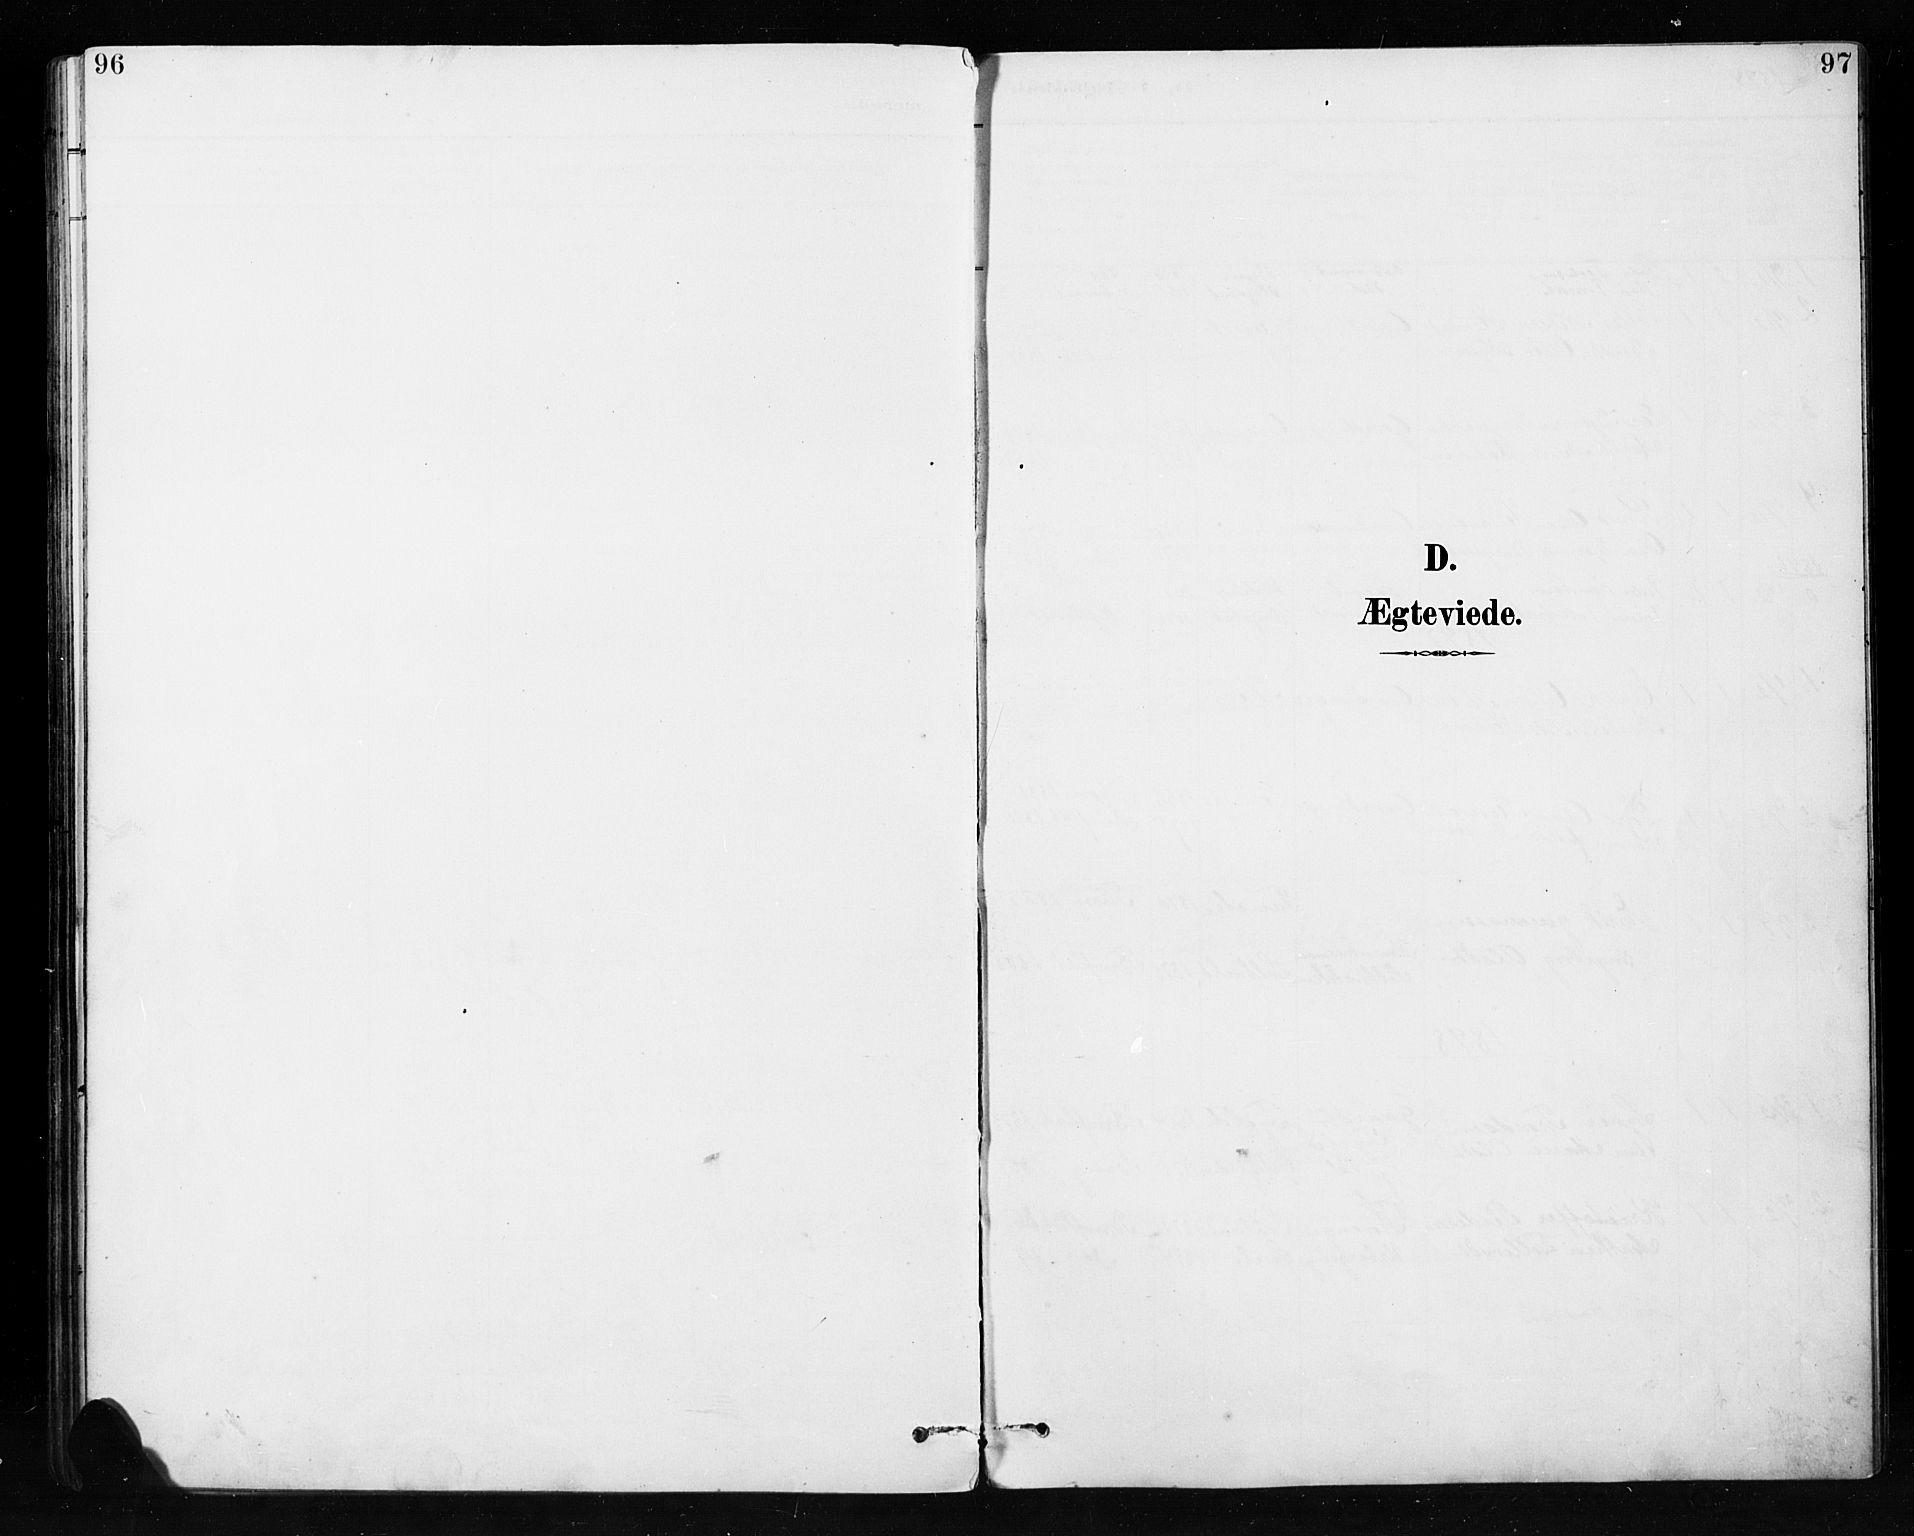 SAH, Etnedal prestekontor, H/Ha/Hab/Habb/L0001: Klokkerbok nr. II 1, 1894-1911, s. 96-97